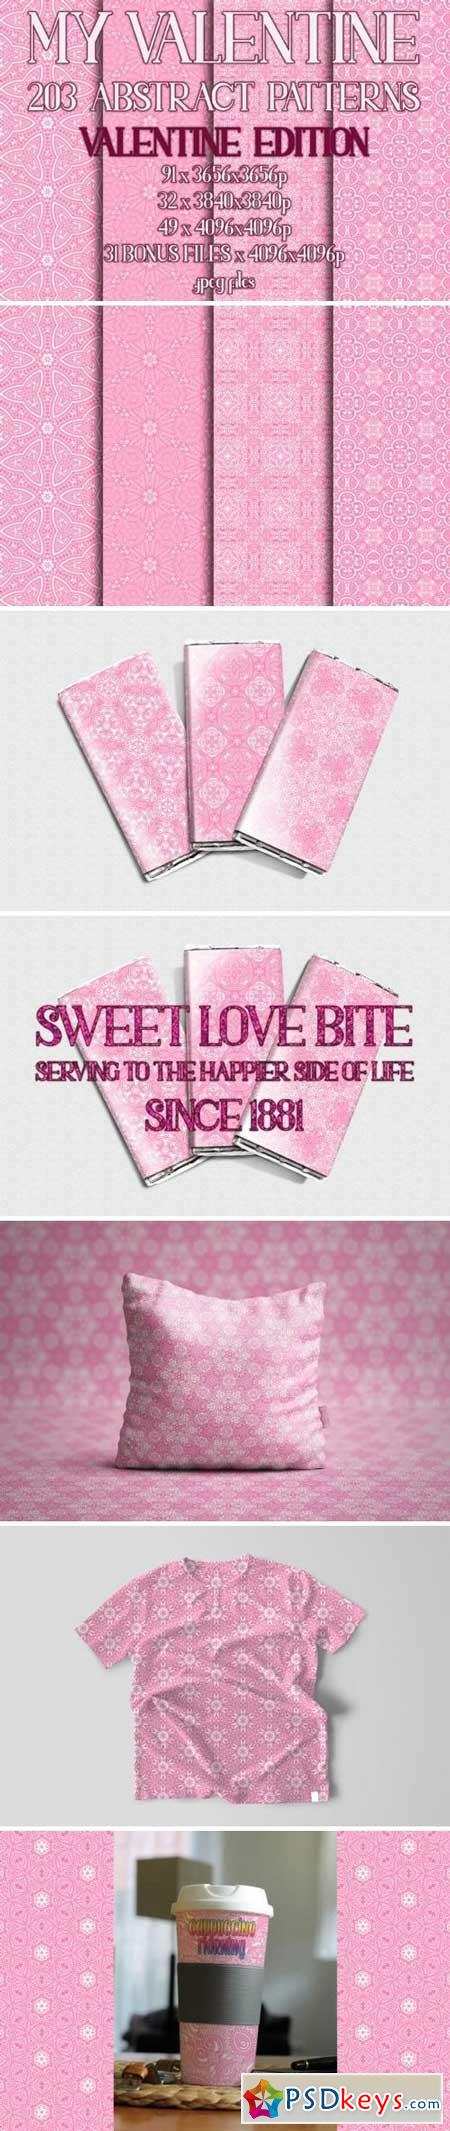 My Valentine 866290